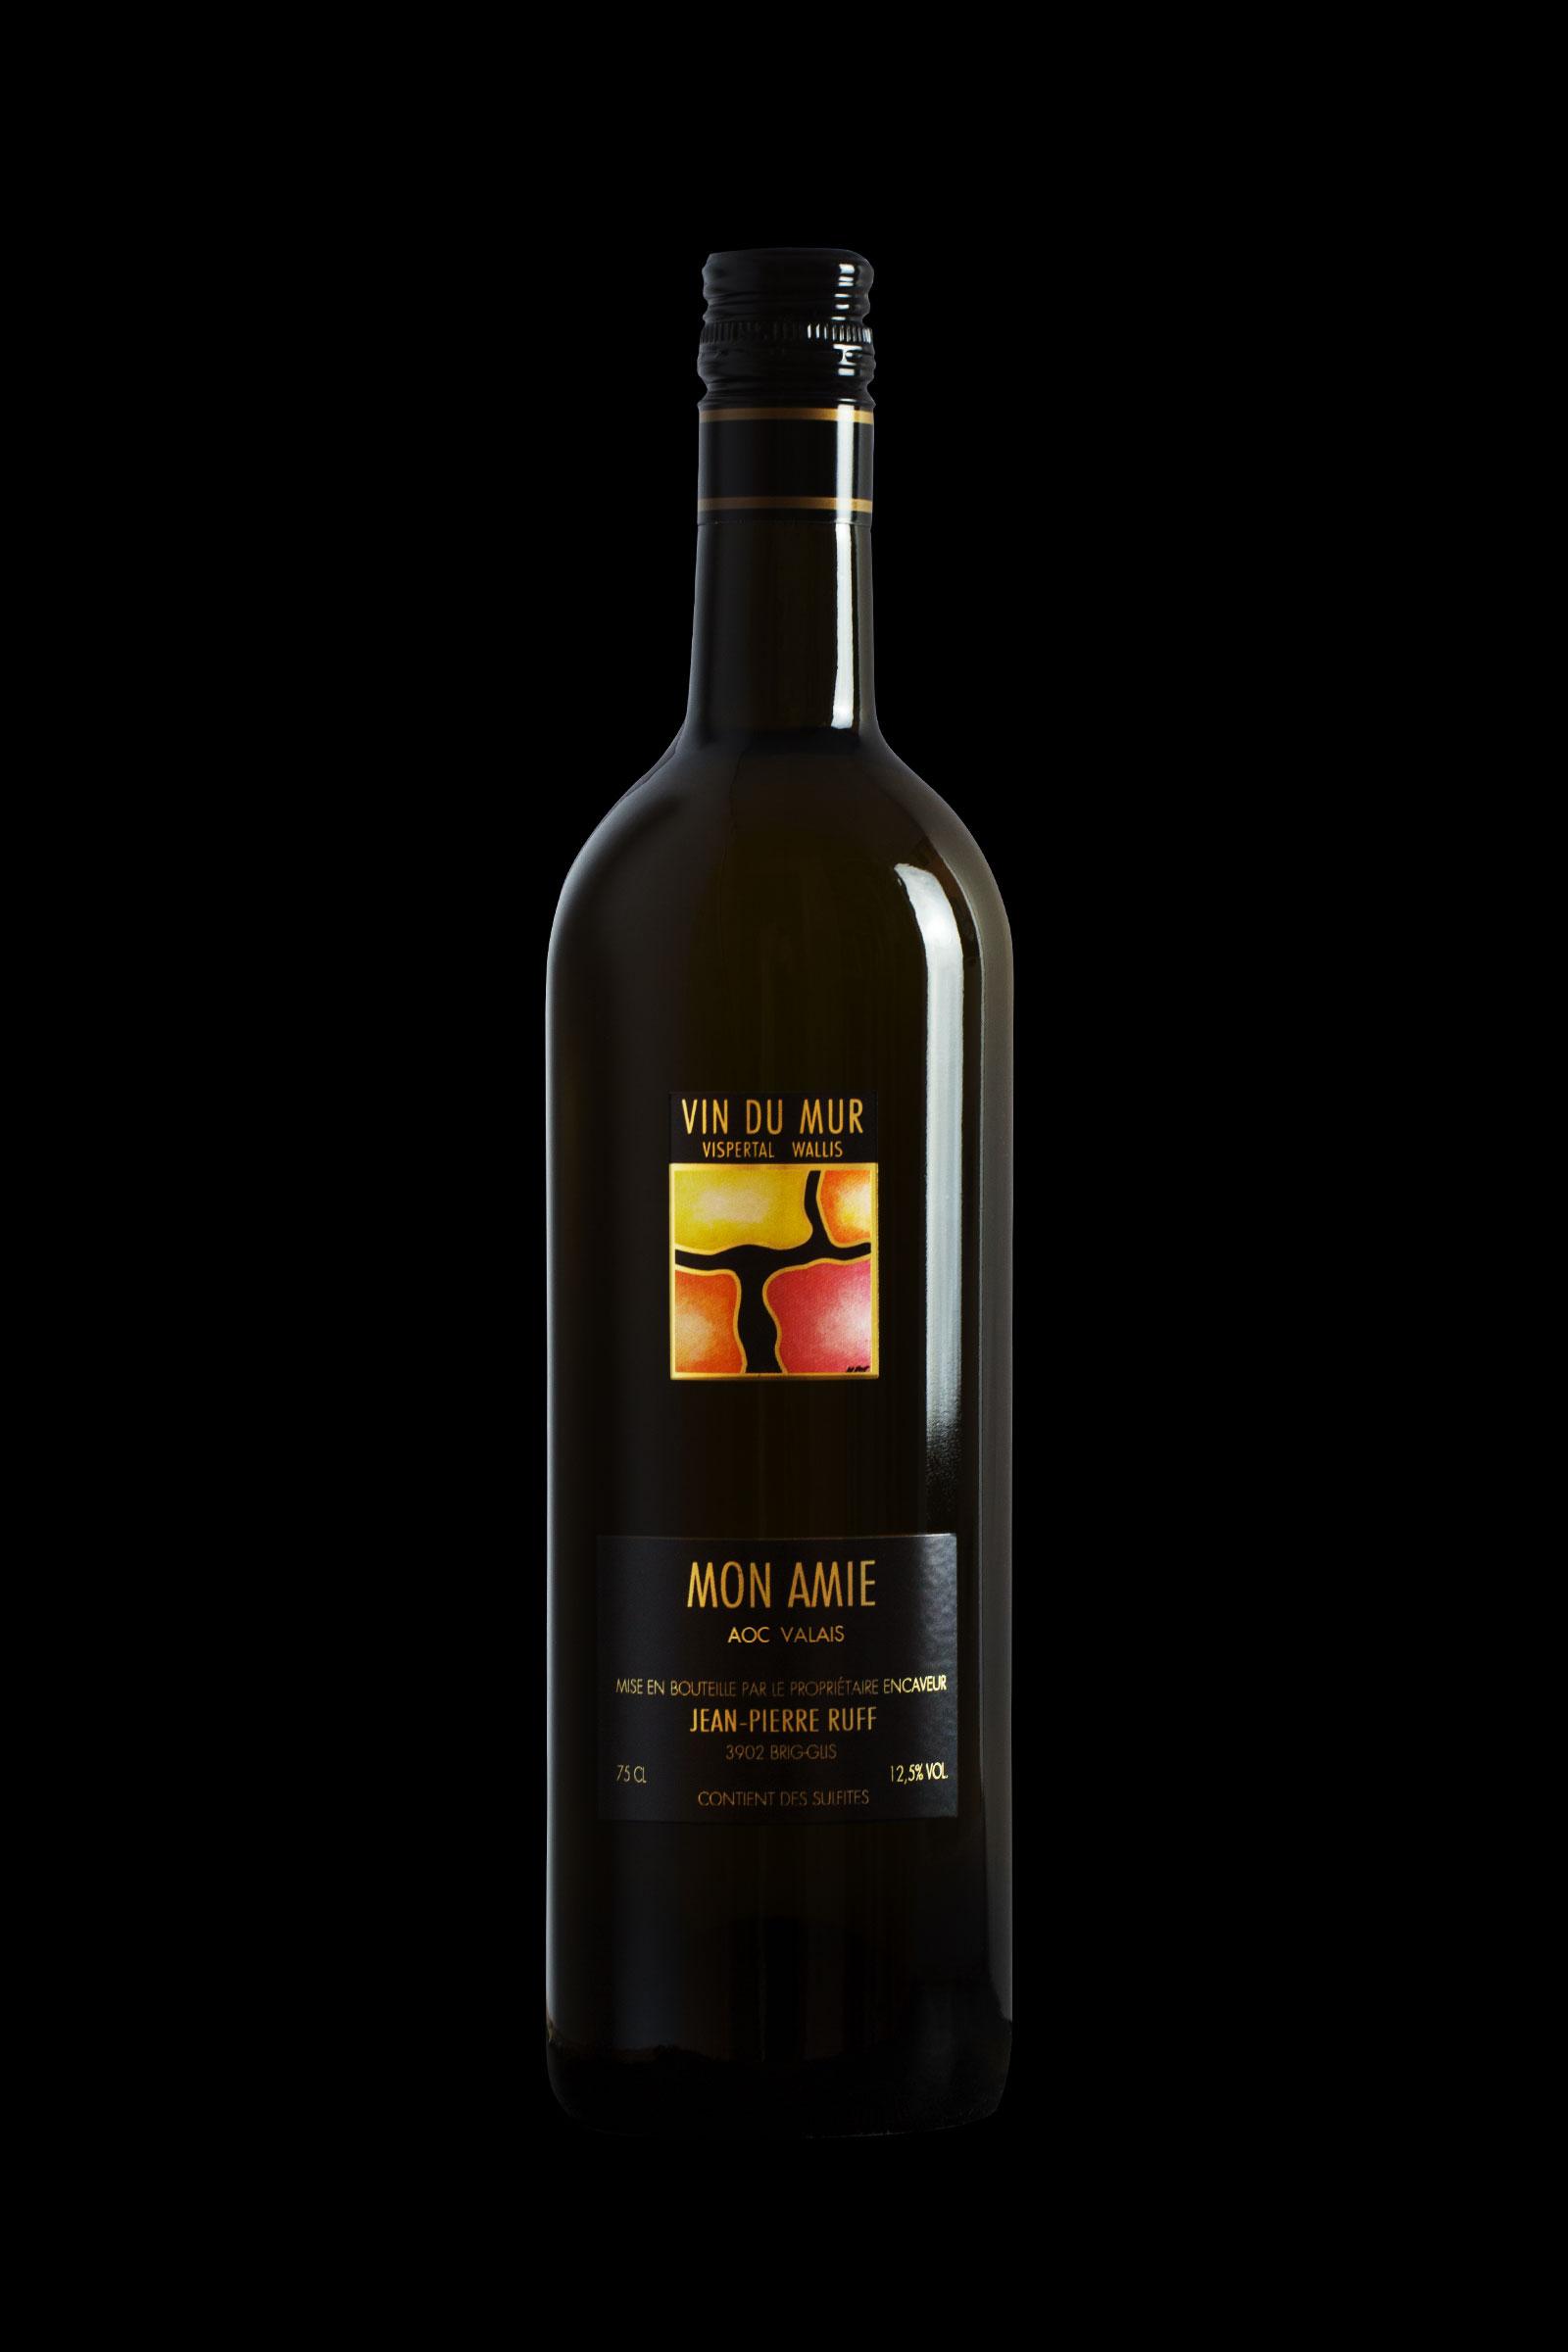 monamie-vin-du-mur